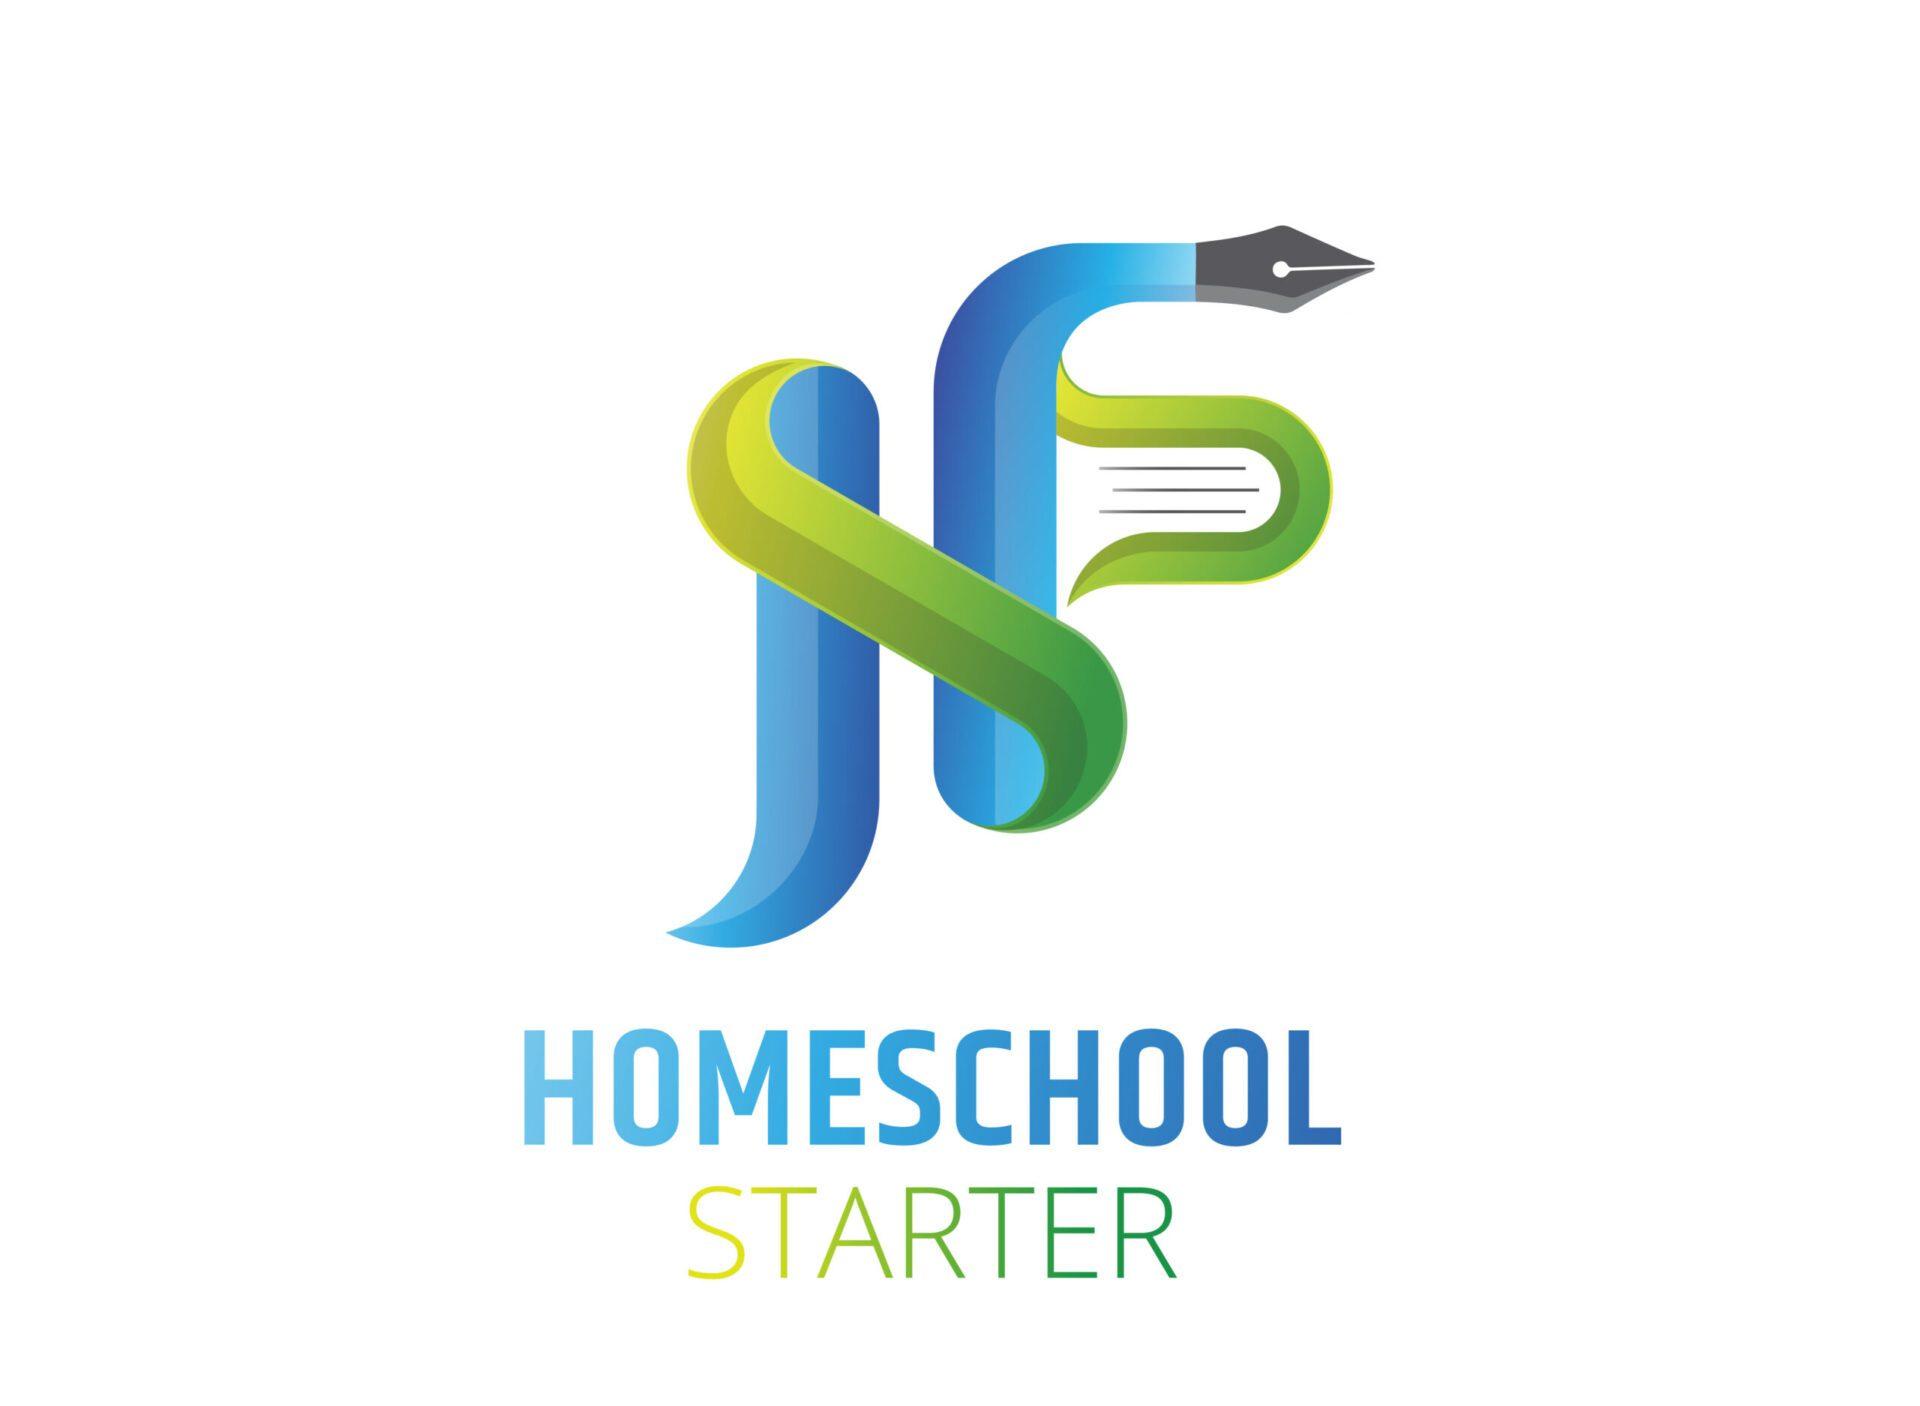 Homeschool Starter-01